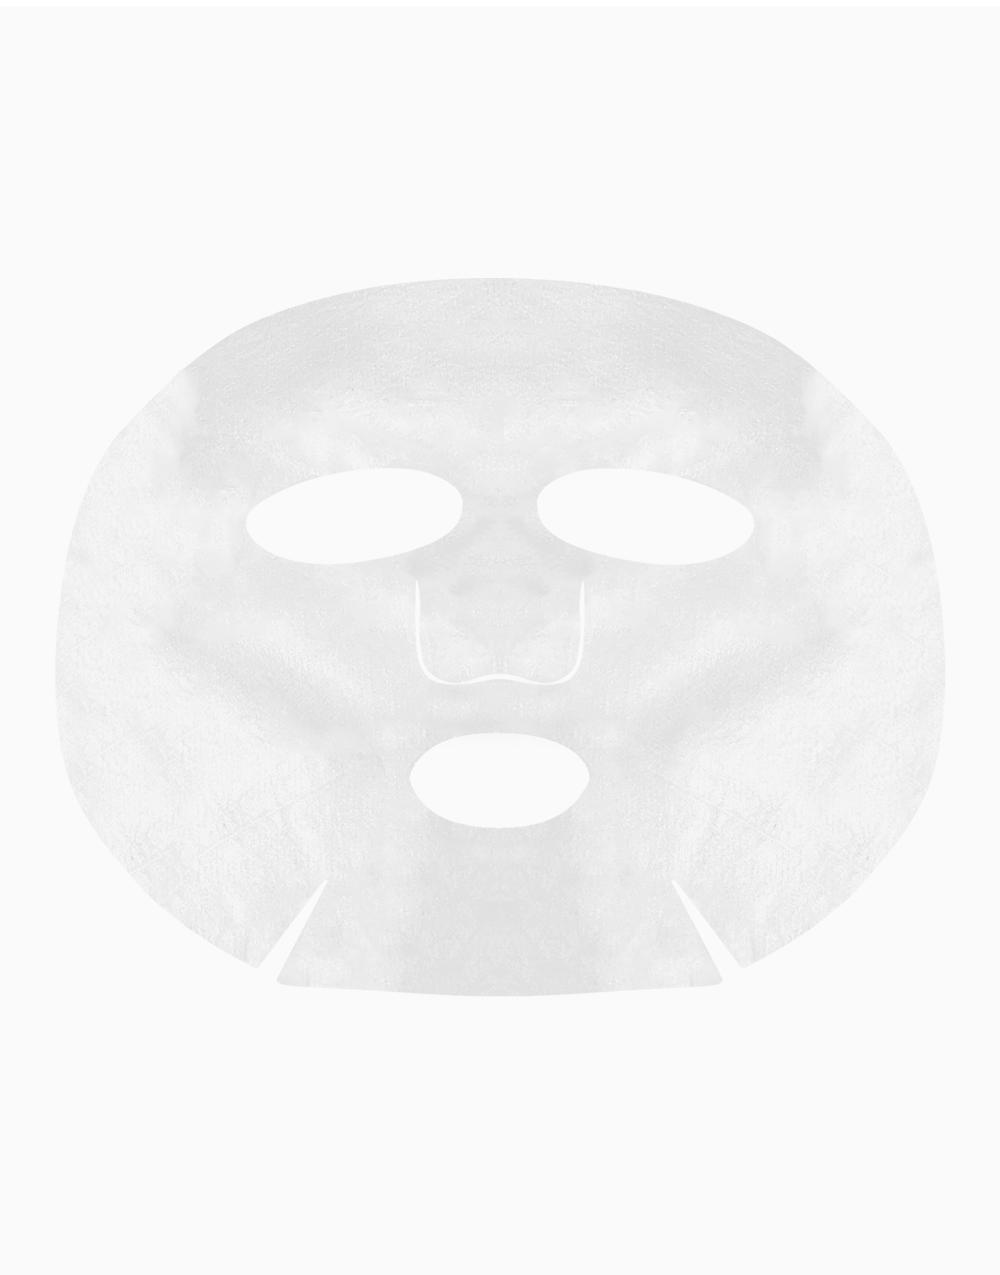 Pure Skin Honey Essence Mask Sheet by Esfolio